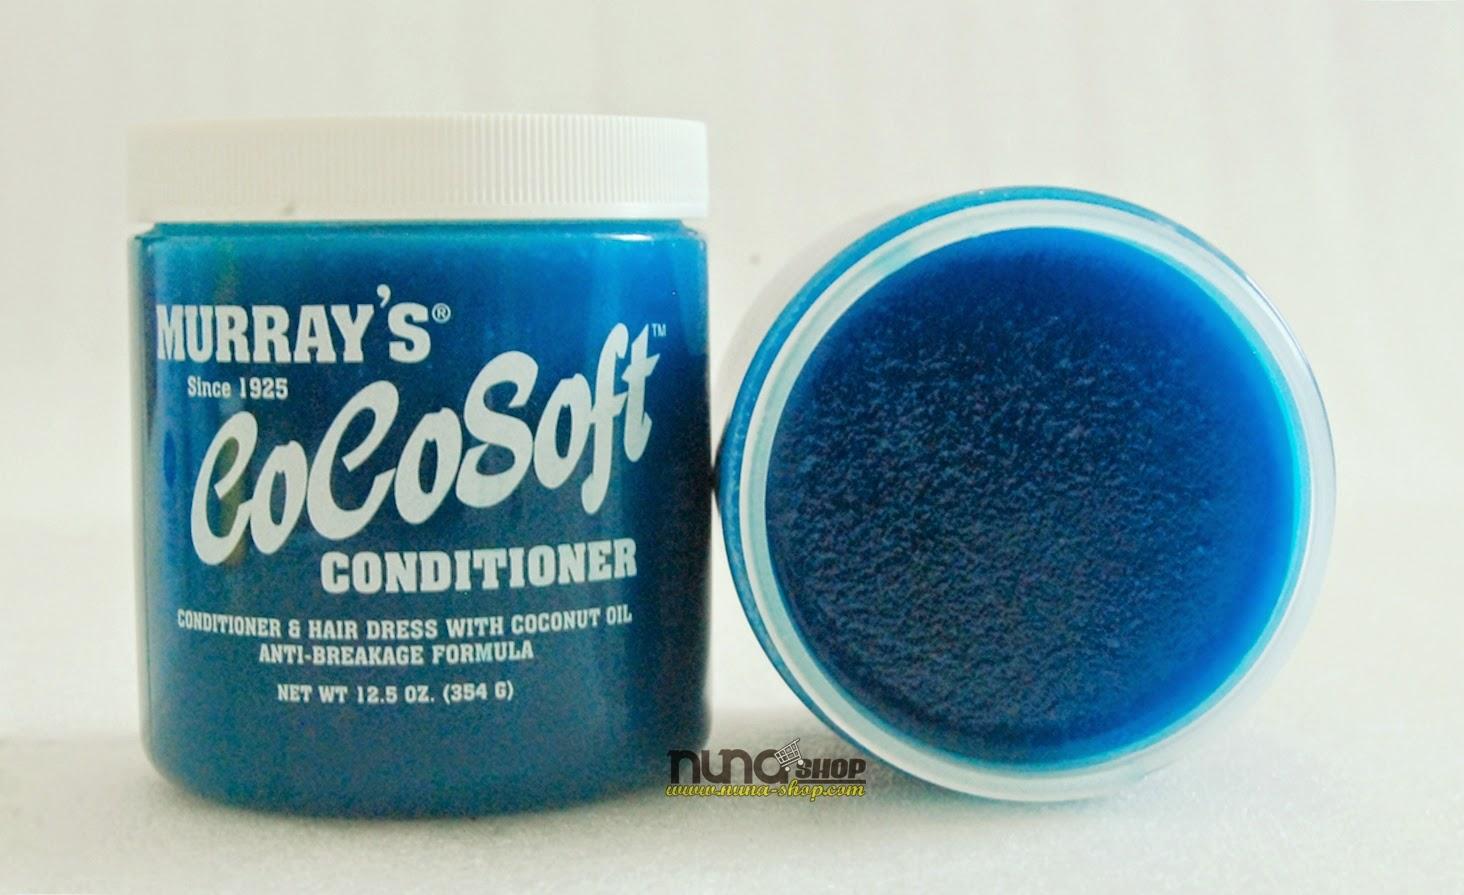 Murray's Cocosoft Blue Conditioner 12.5oz